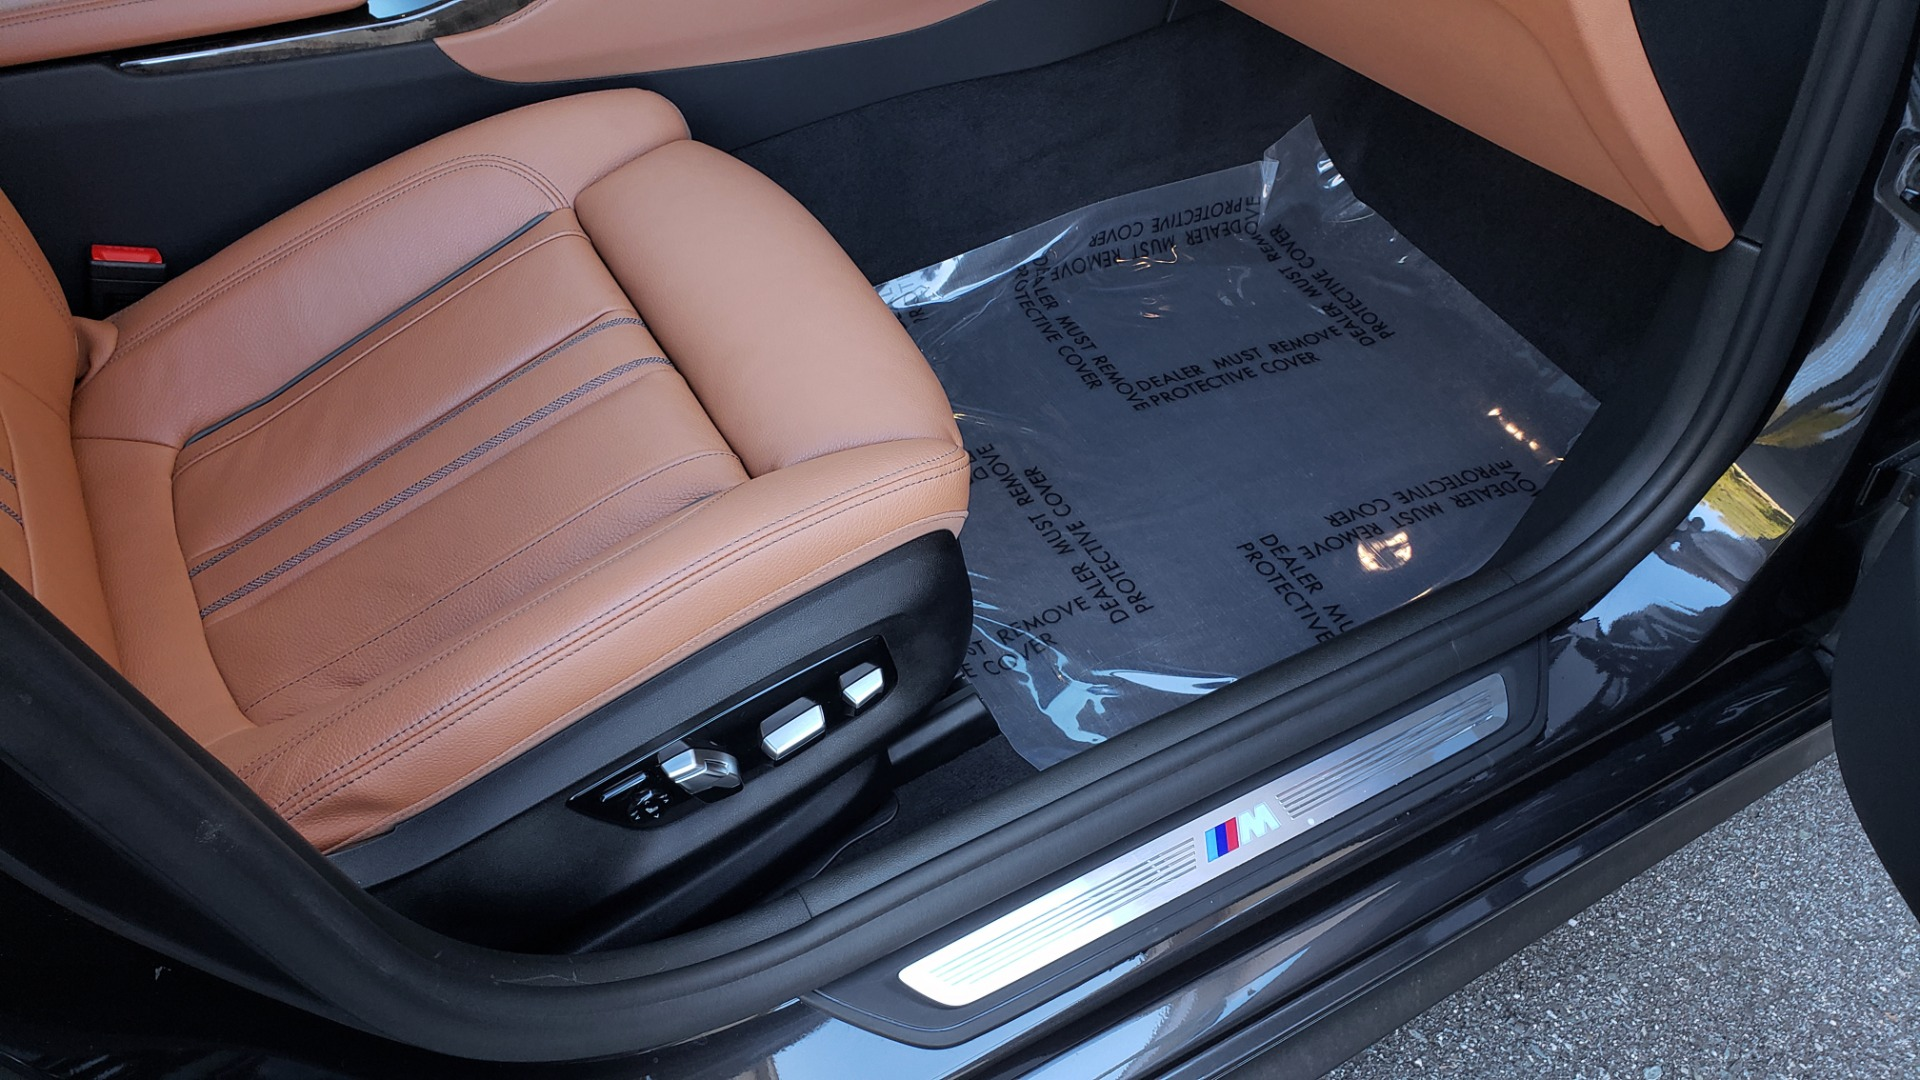 Used 2018 BMW 5 SERIES 540I M-SPORT / DRVR ASST / EXEC PKG / NAV / SUNROOF / HUD / REARVIEW for sale Sold at Formula Imports in Charlotte NC 28227 66